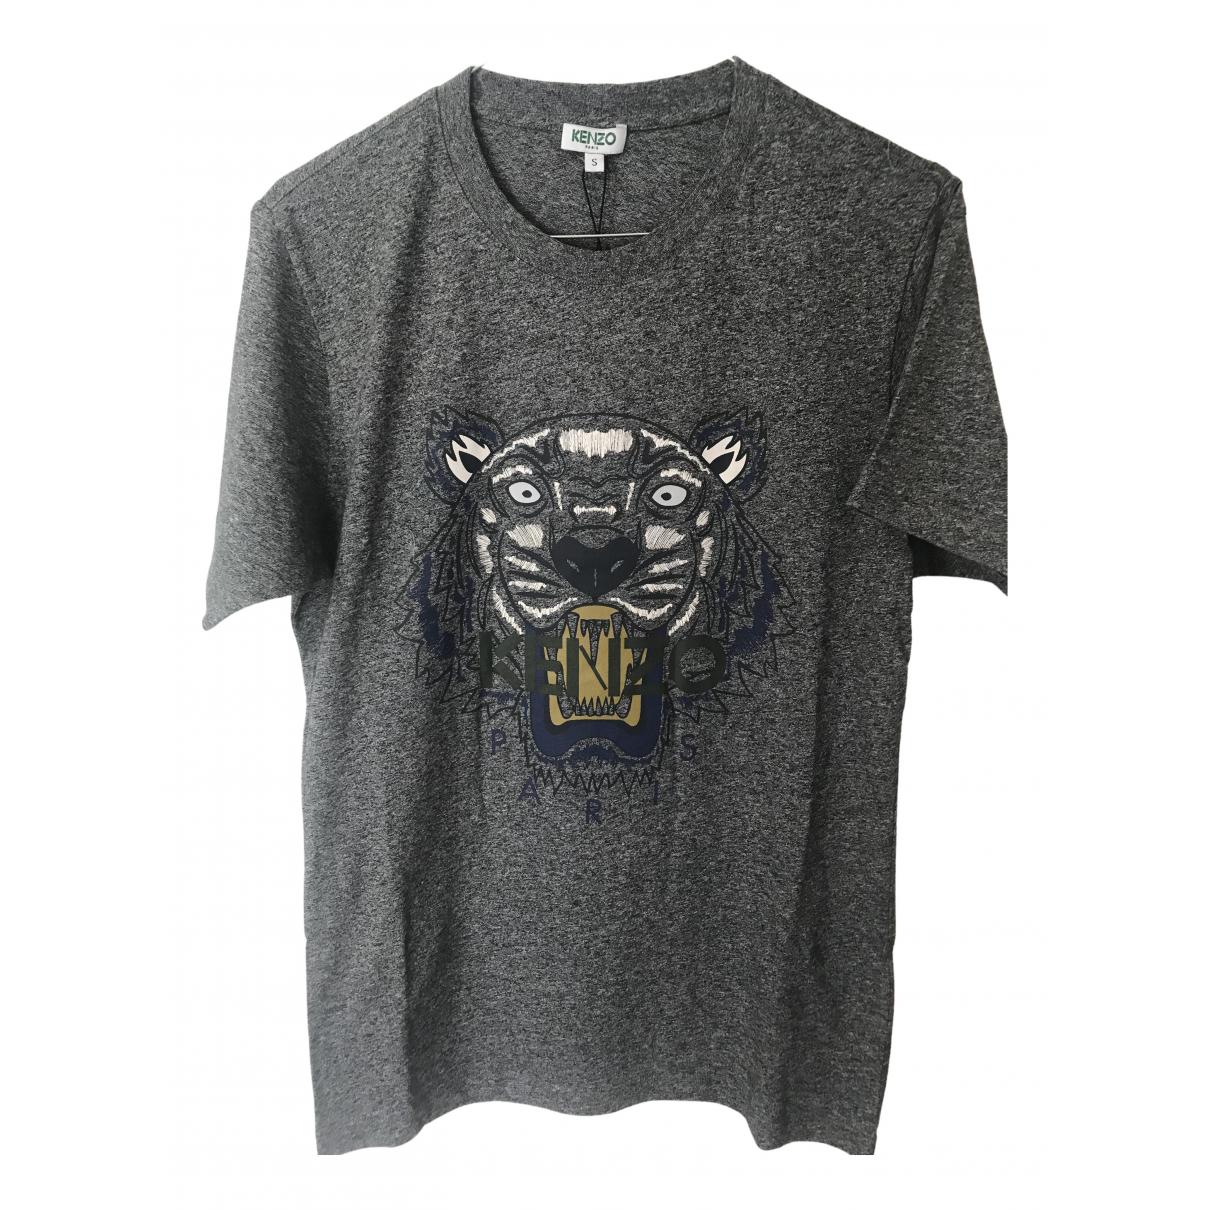 Kenzo \N Grey Cotton T-shirts for Men S International